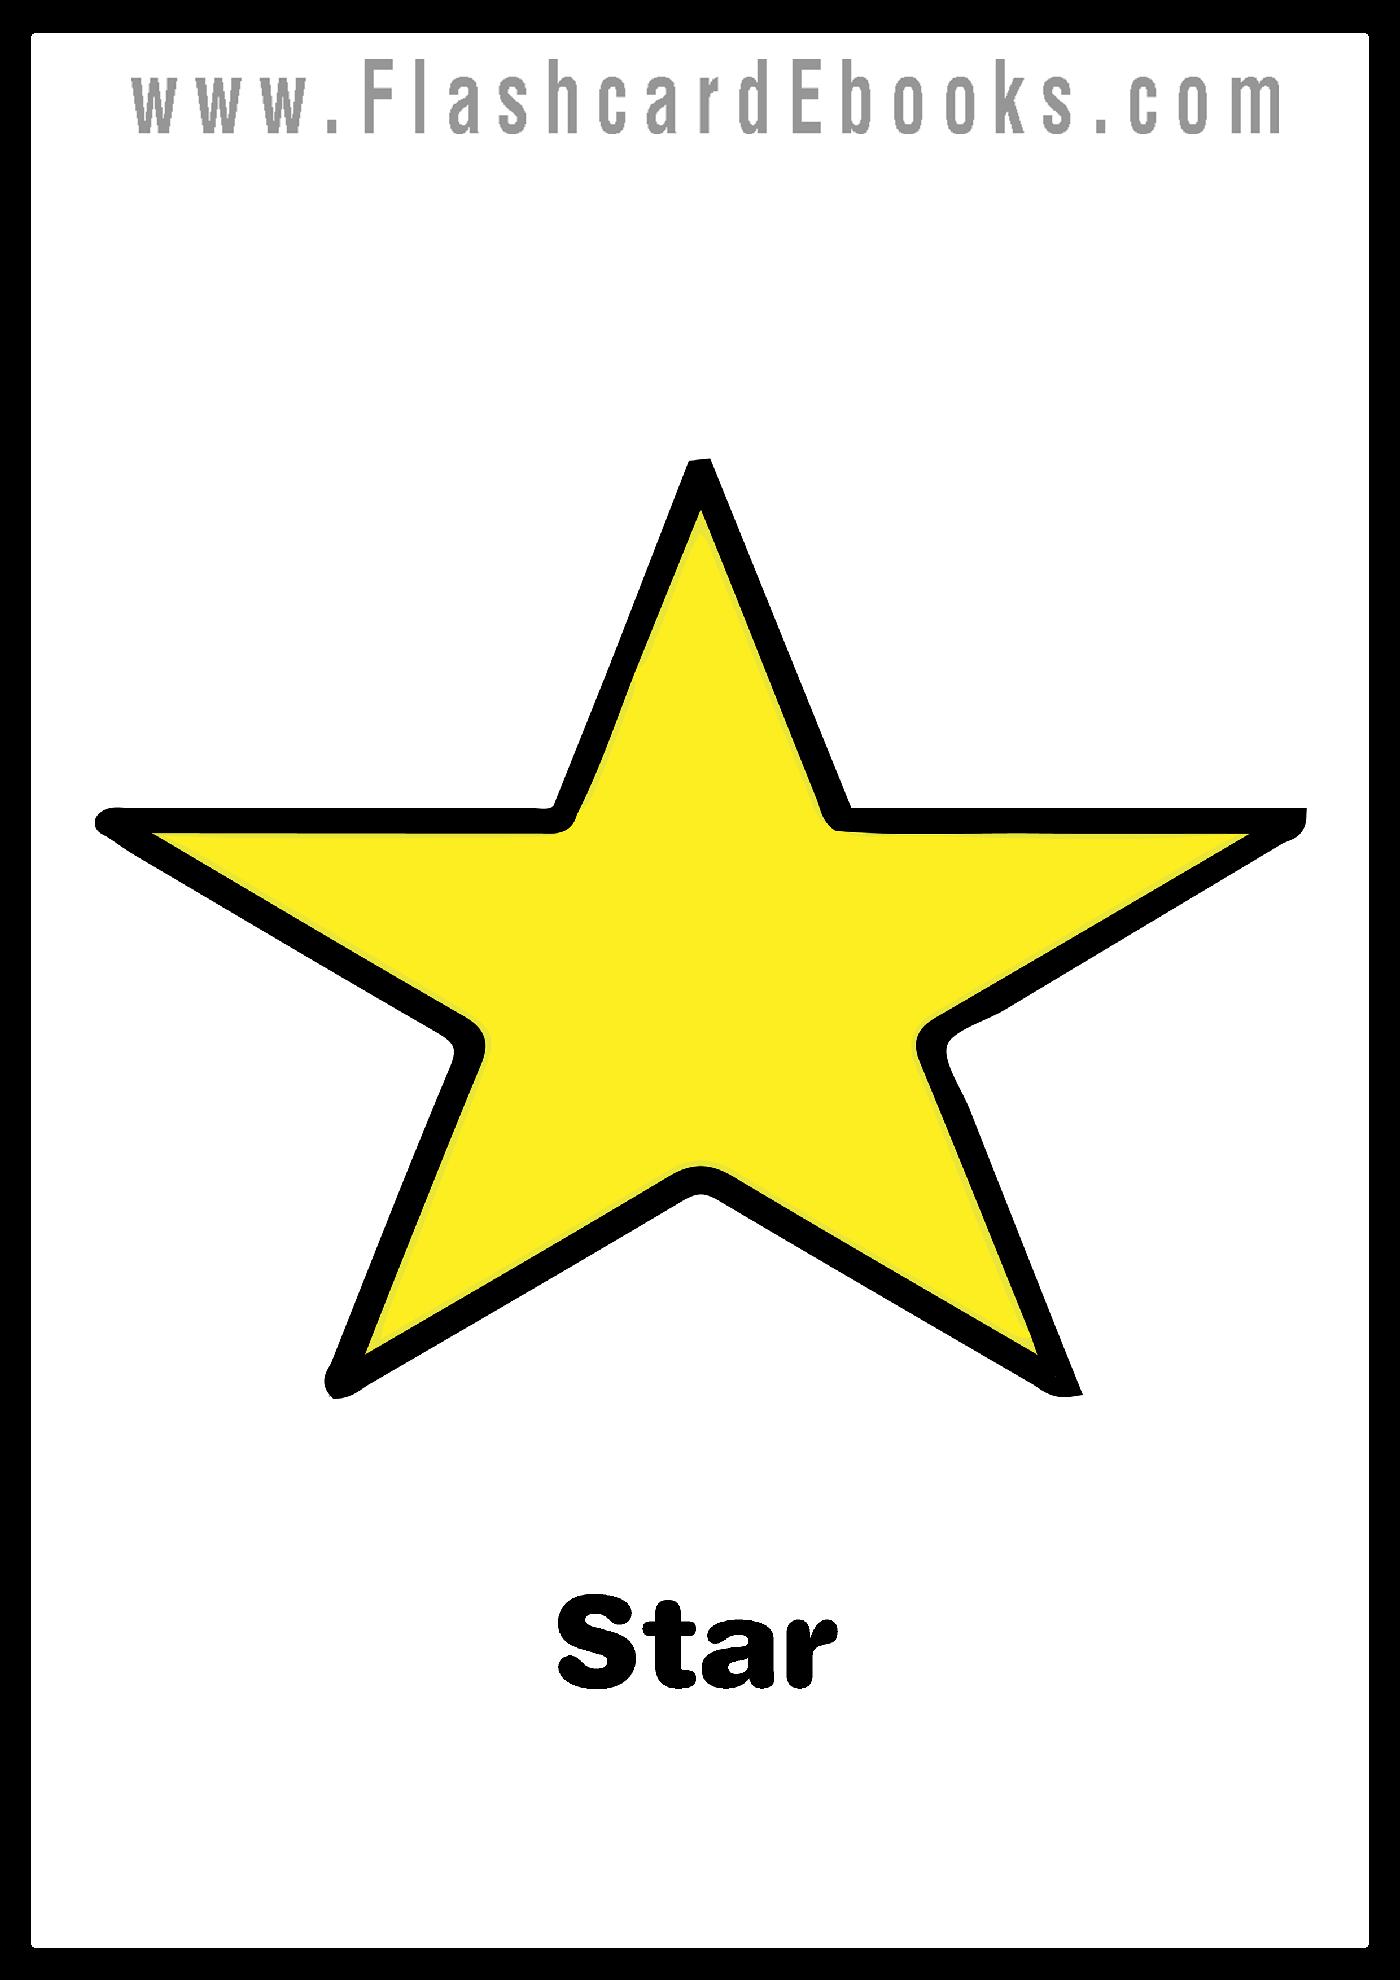 English Flashcard Kindle Shapes Star